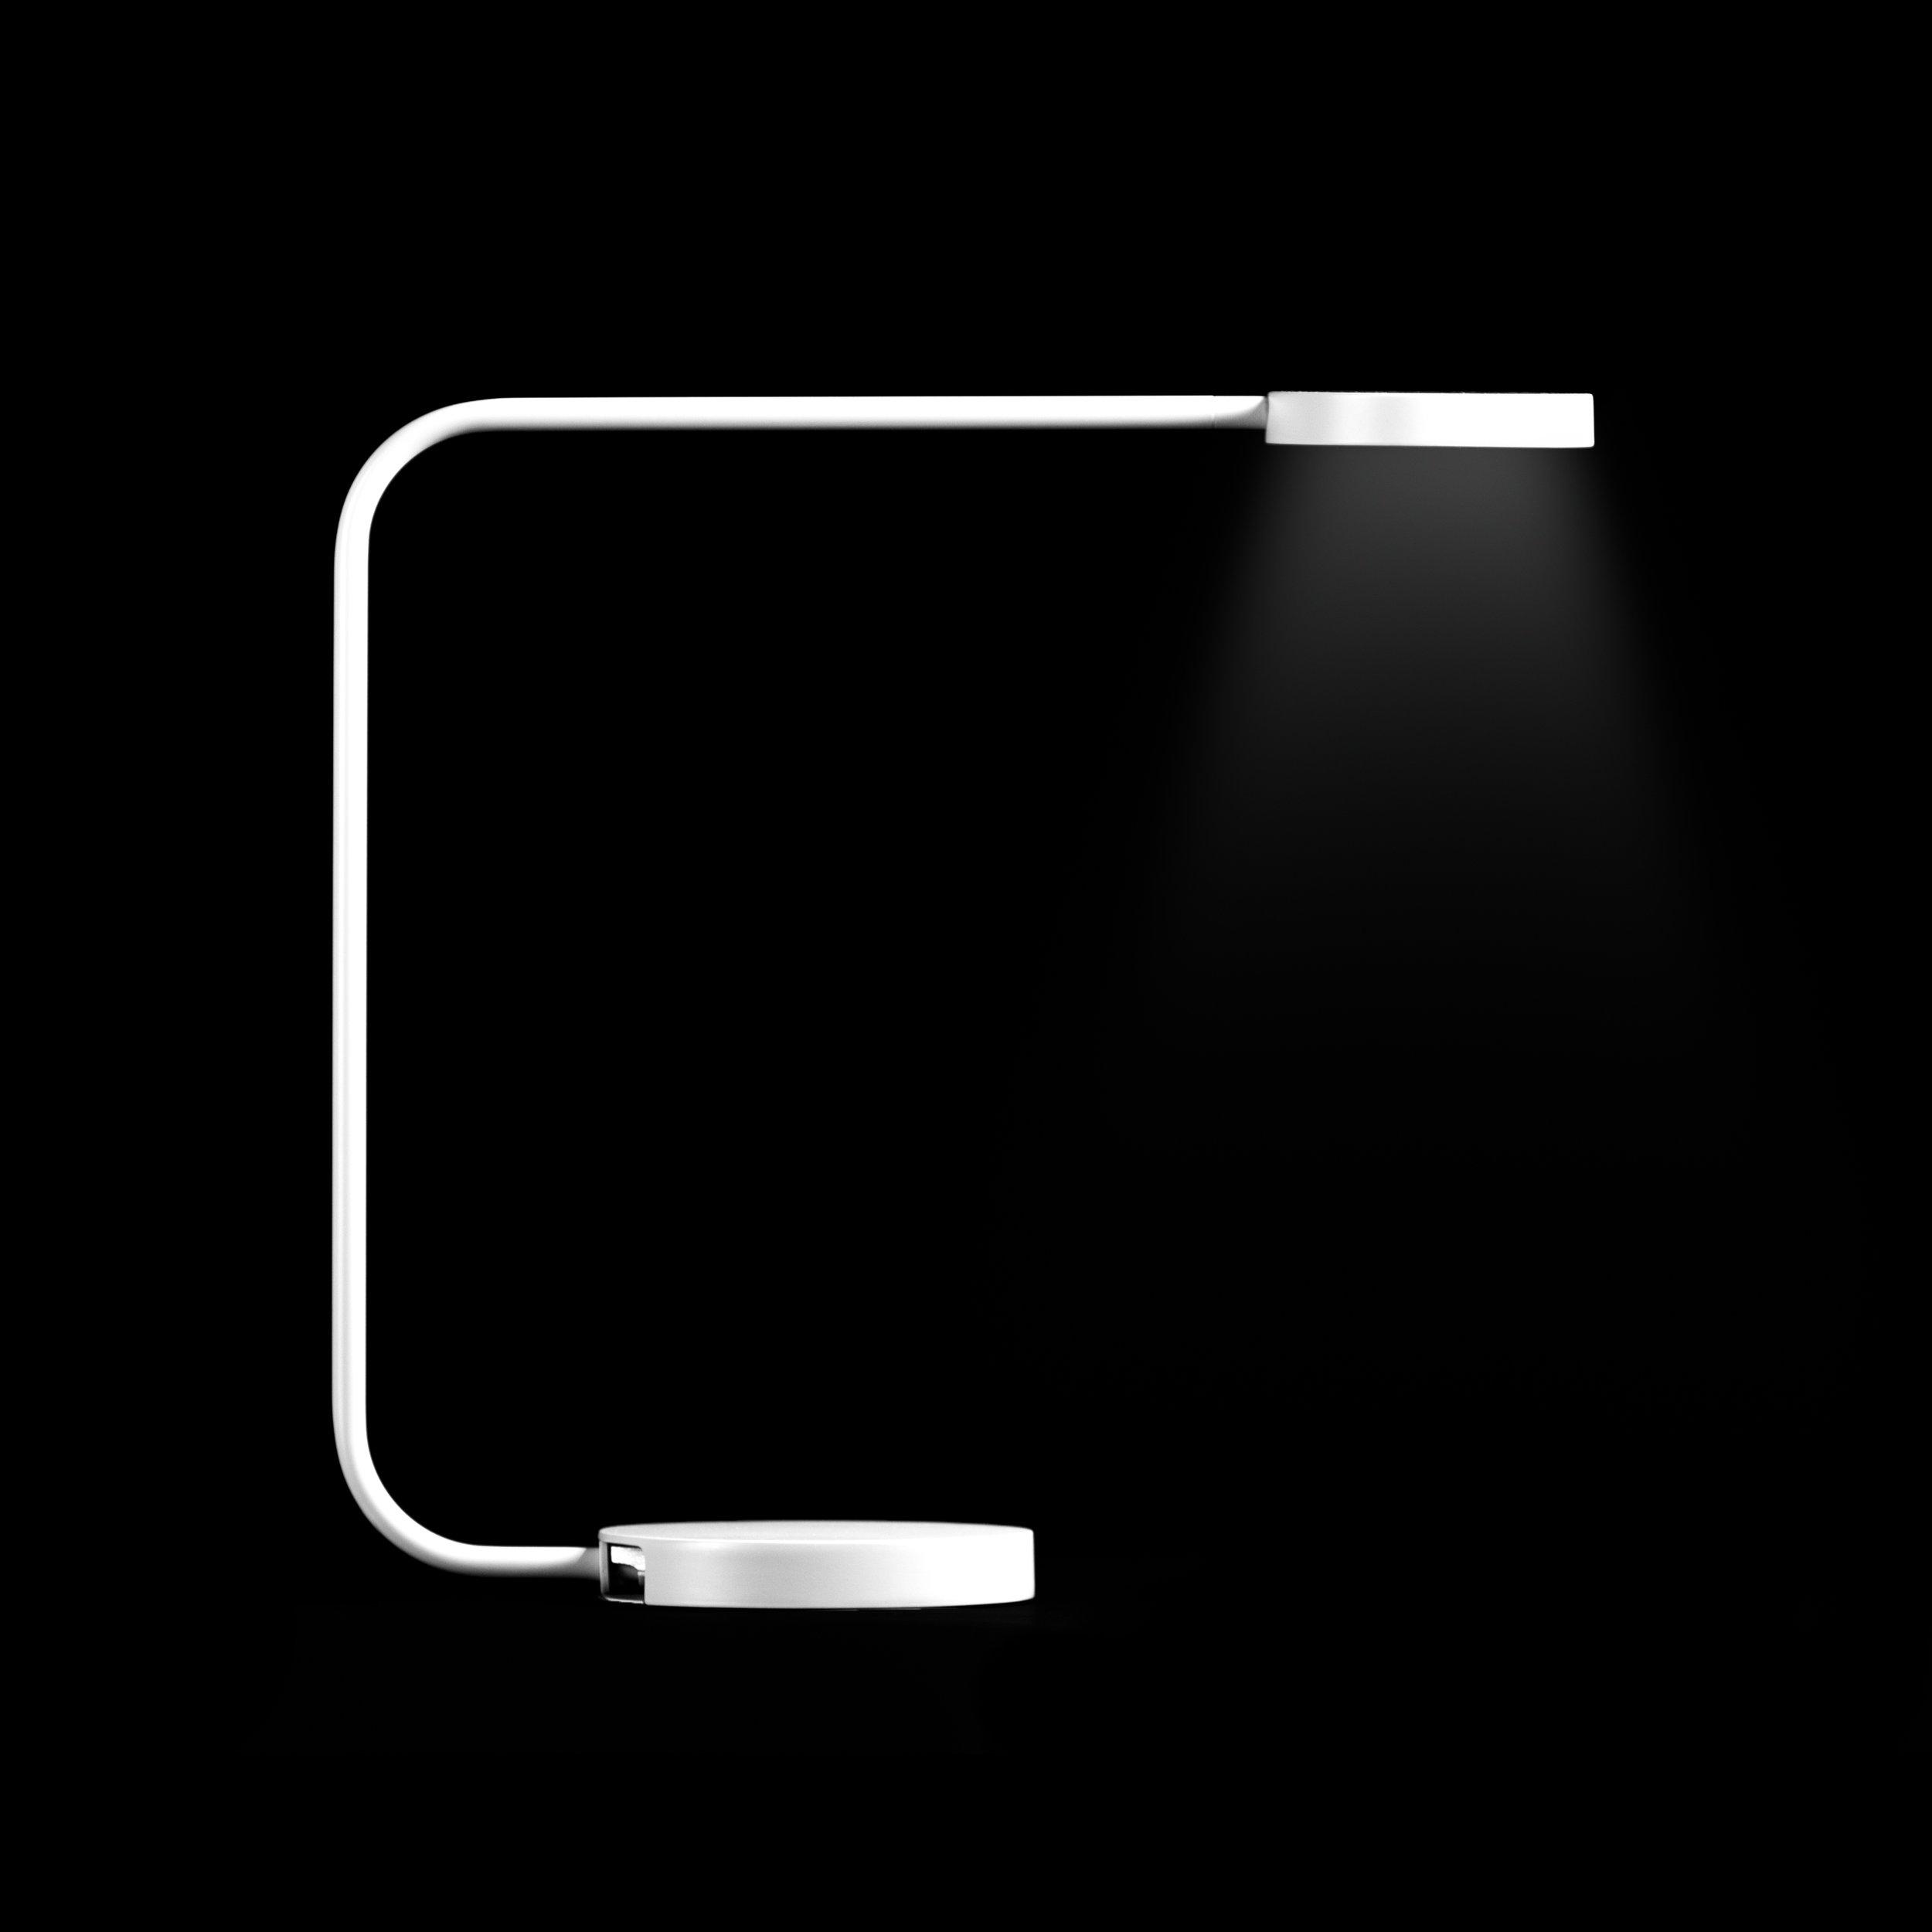 White Lamp 2-537-Edit-3-Edit-Edit-3.jpg